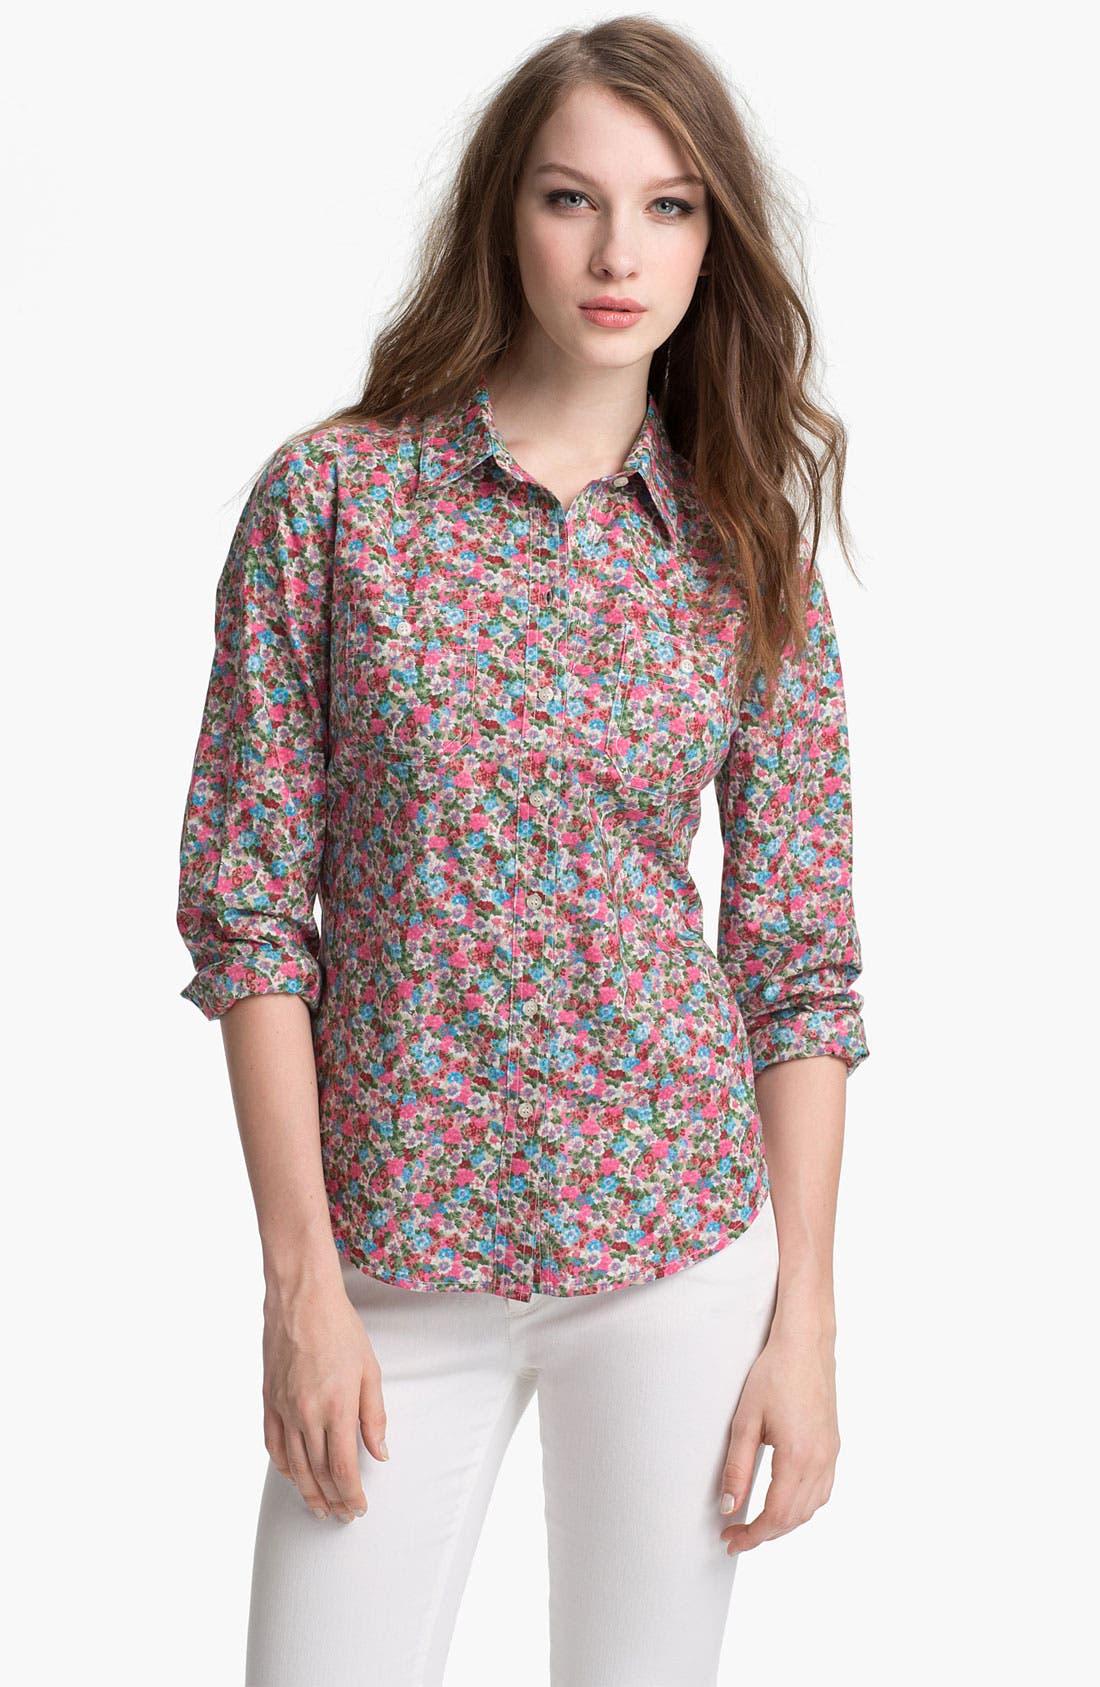 Alternate Image 1 Selected - Sandra Ingrish Cotton Shirt (Petite)